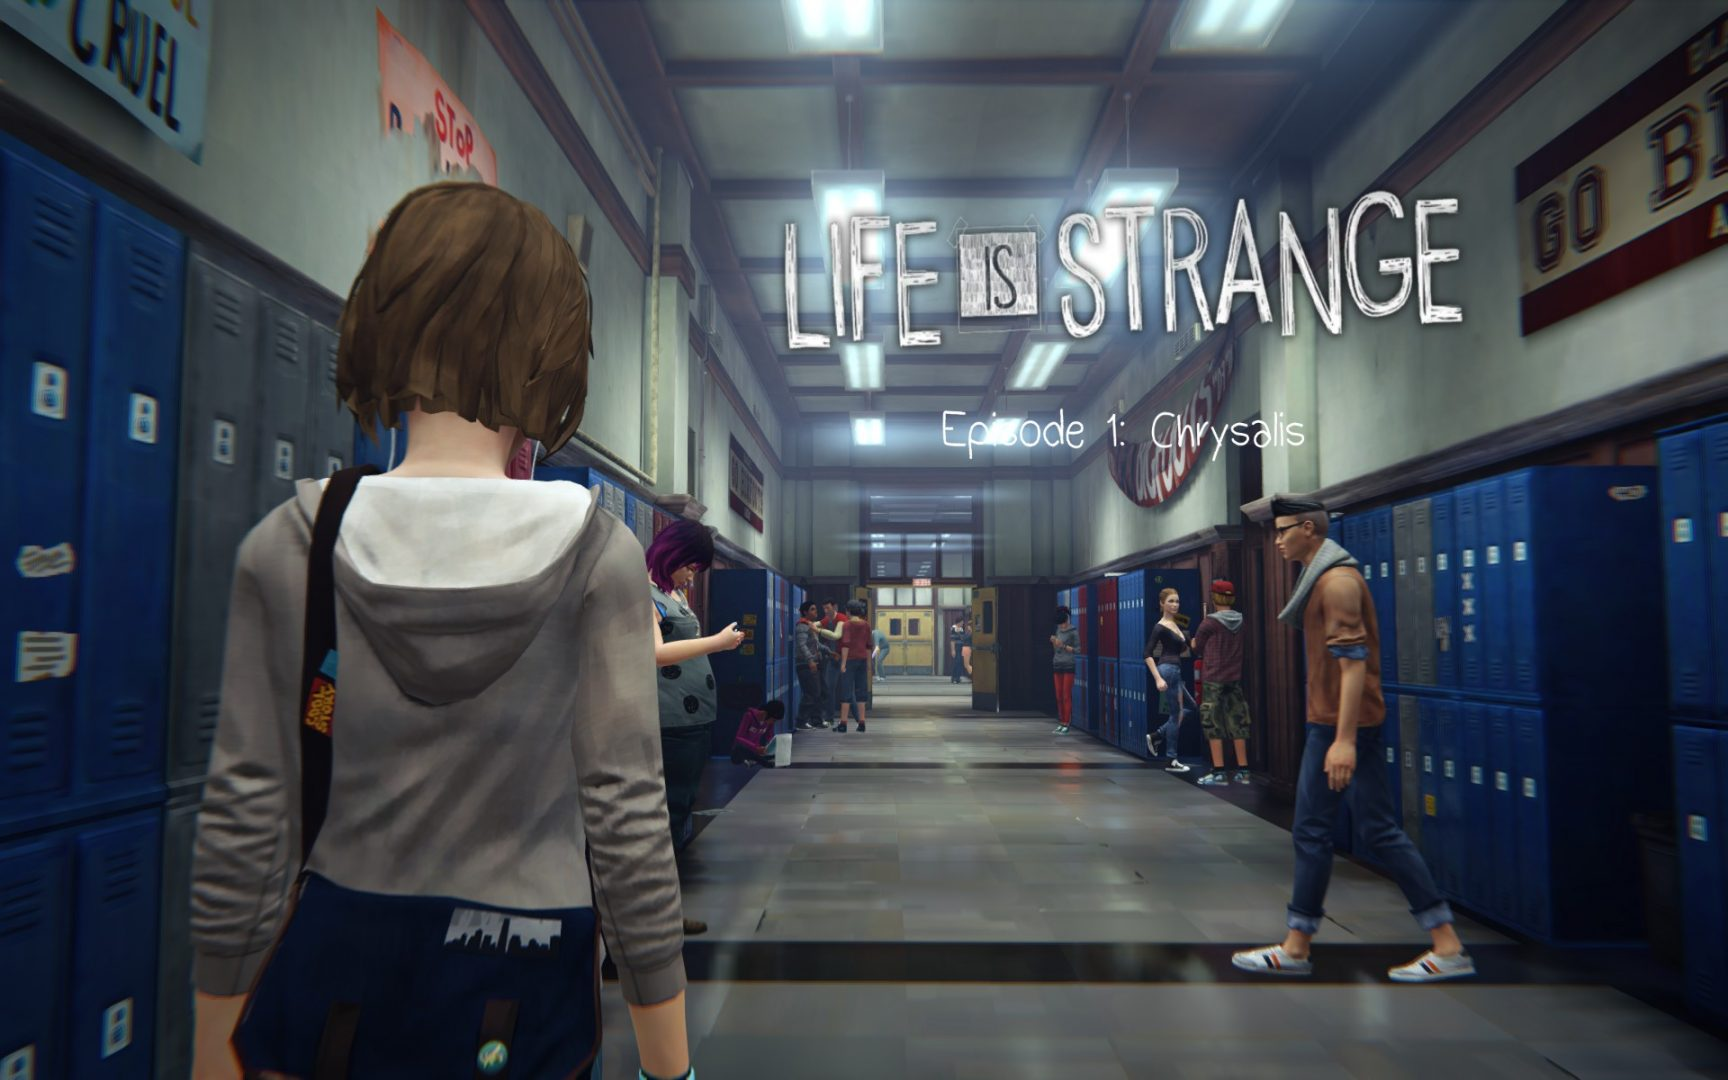 Review: Life is Strange Episode 1 – Chrysalis